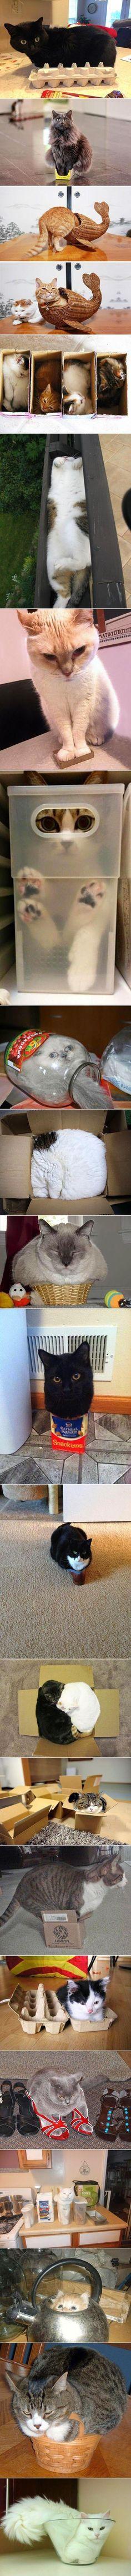 Wie Katzen so sind   Webfail - Fail Bilder und Fail Videos